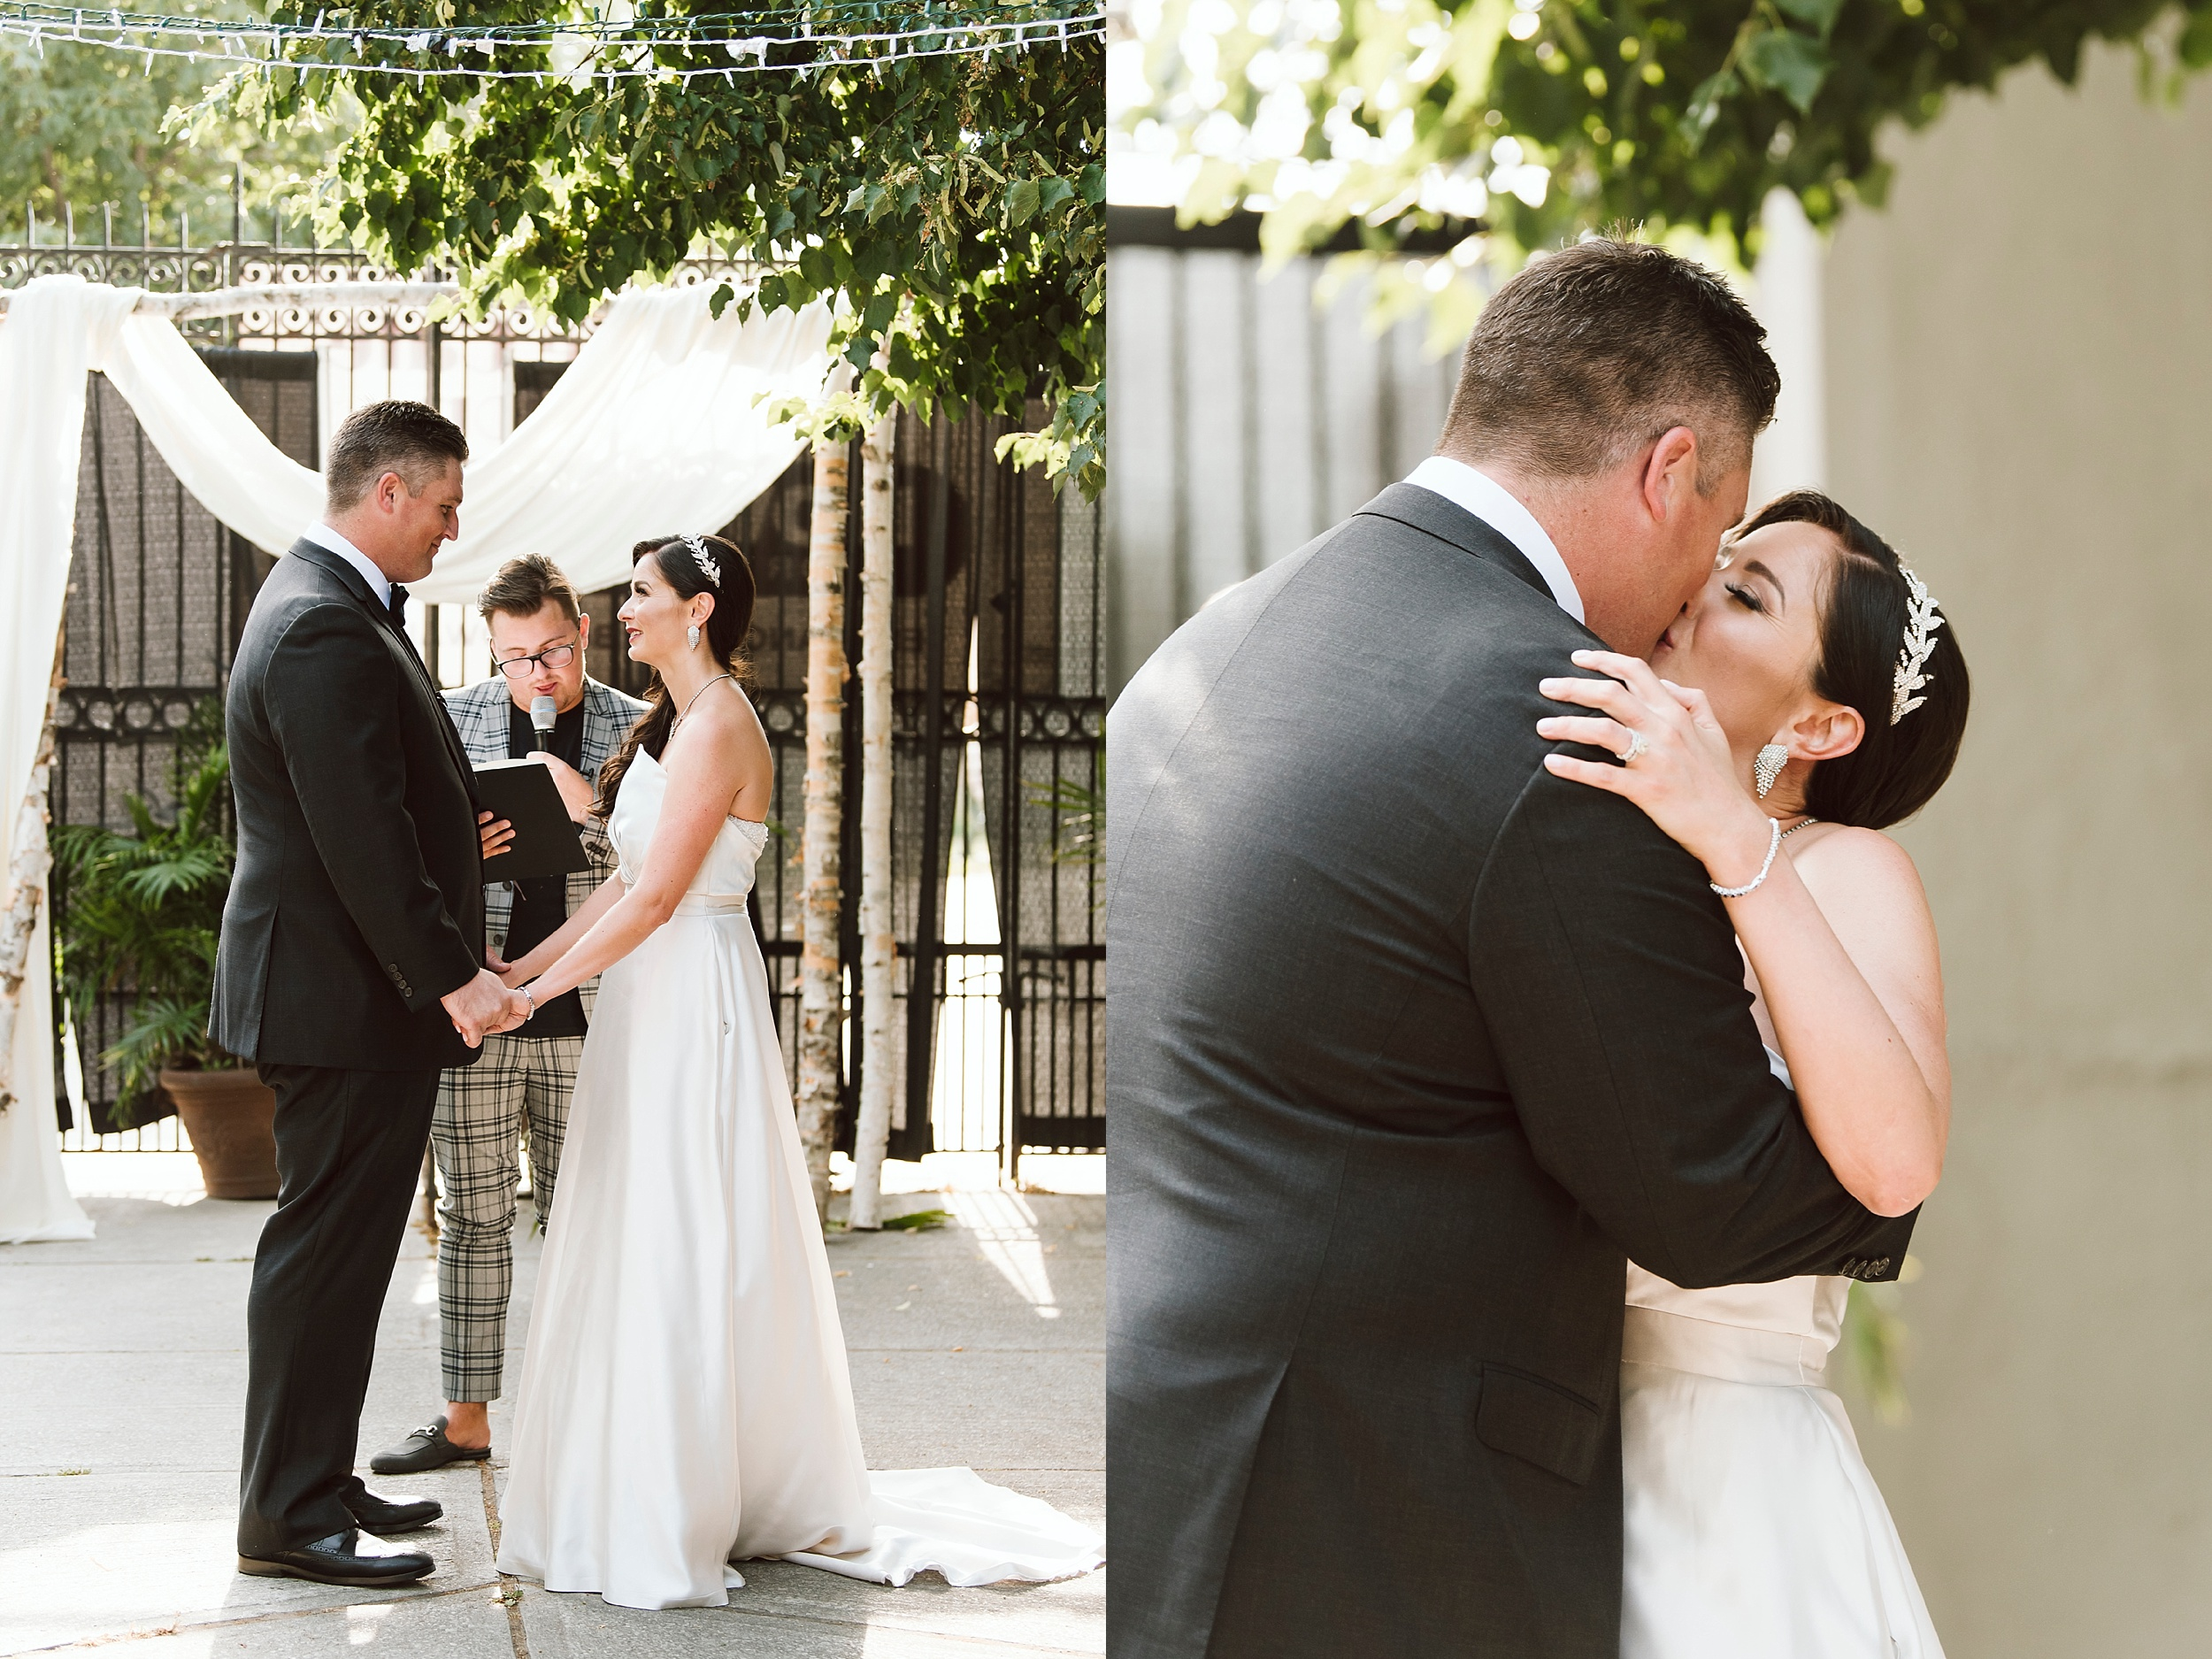 Sunnyside_Pavilion_Wedding_Toronto_Photographer_0049.jpg